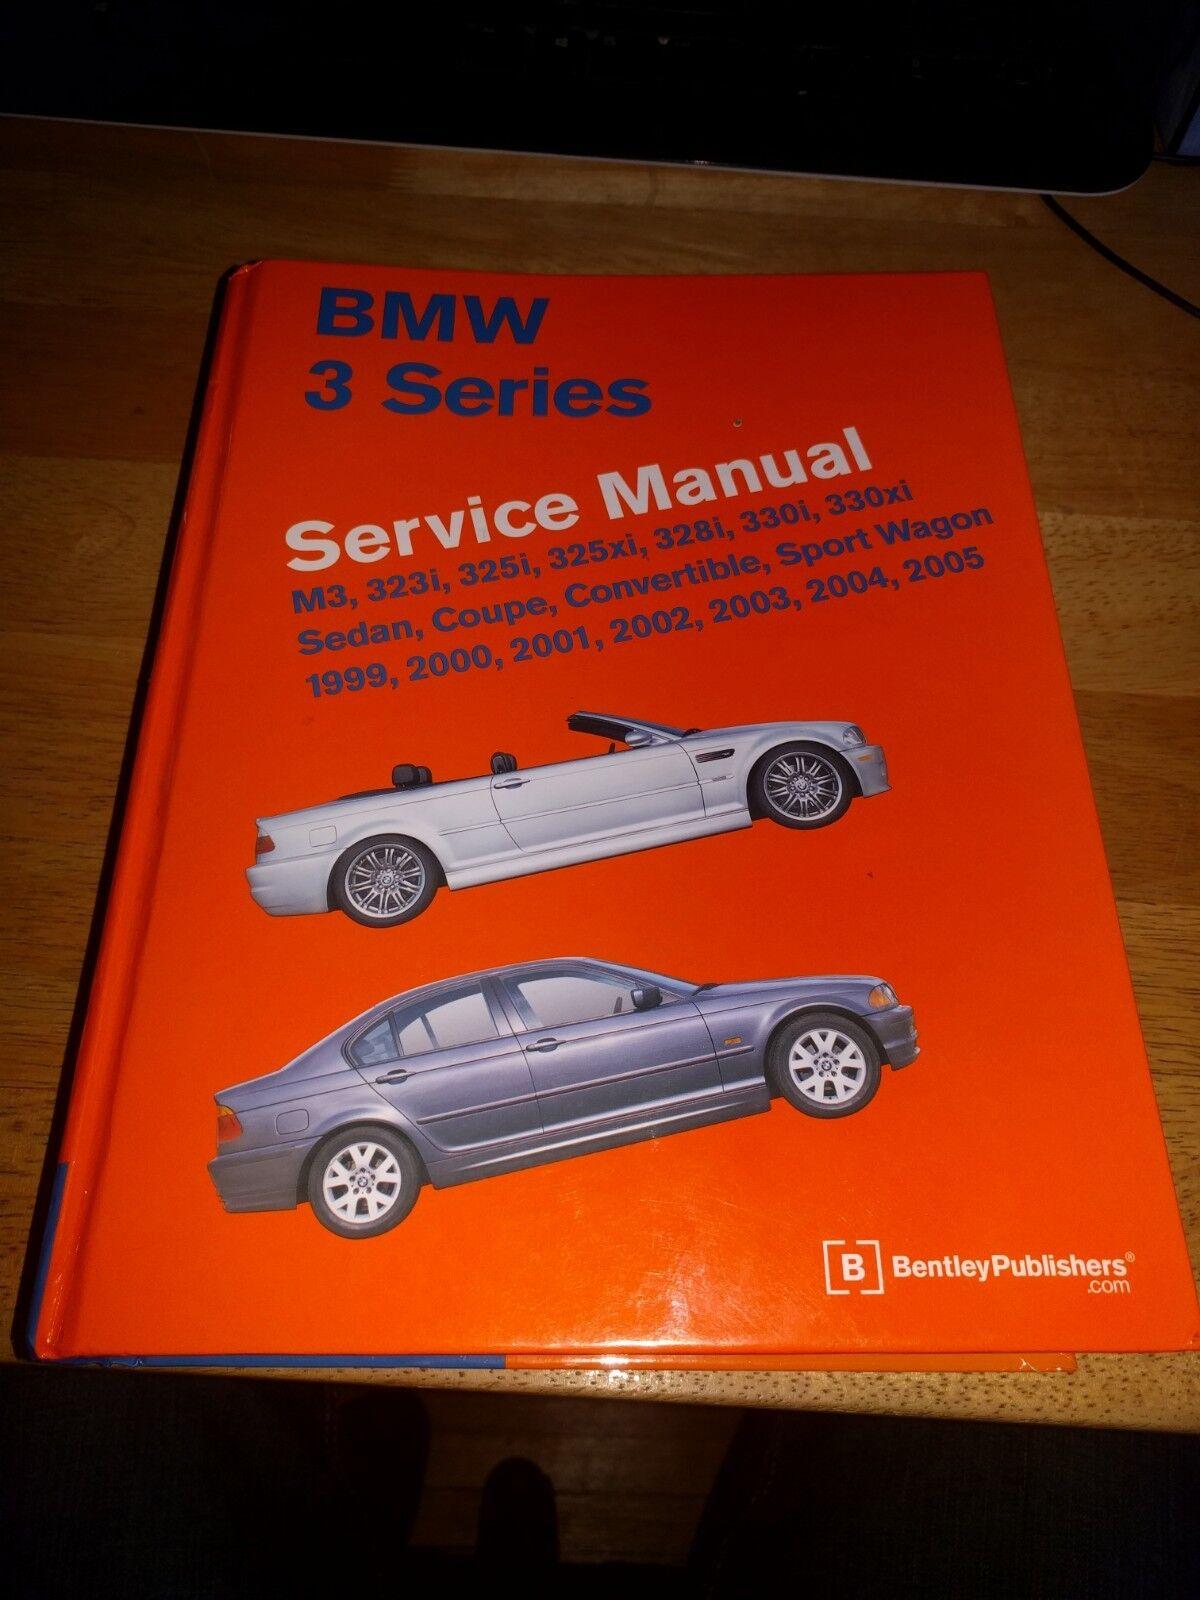 BMW 3 Series (E46) Service Manual : M3, 323i, 325i, 325xi, 328i, 330i,  330xi, Sedan, Coupe, Convertible, Sport Wagon: 1999, 2000, 2001, 2002,  2003, ...